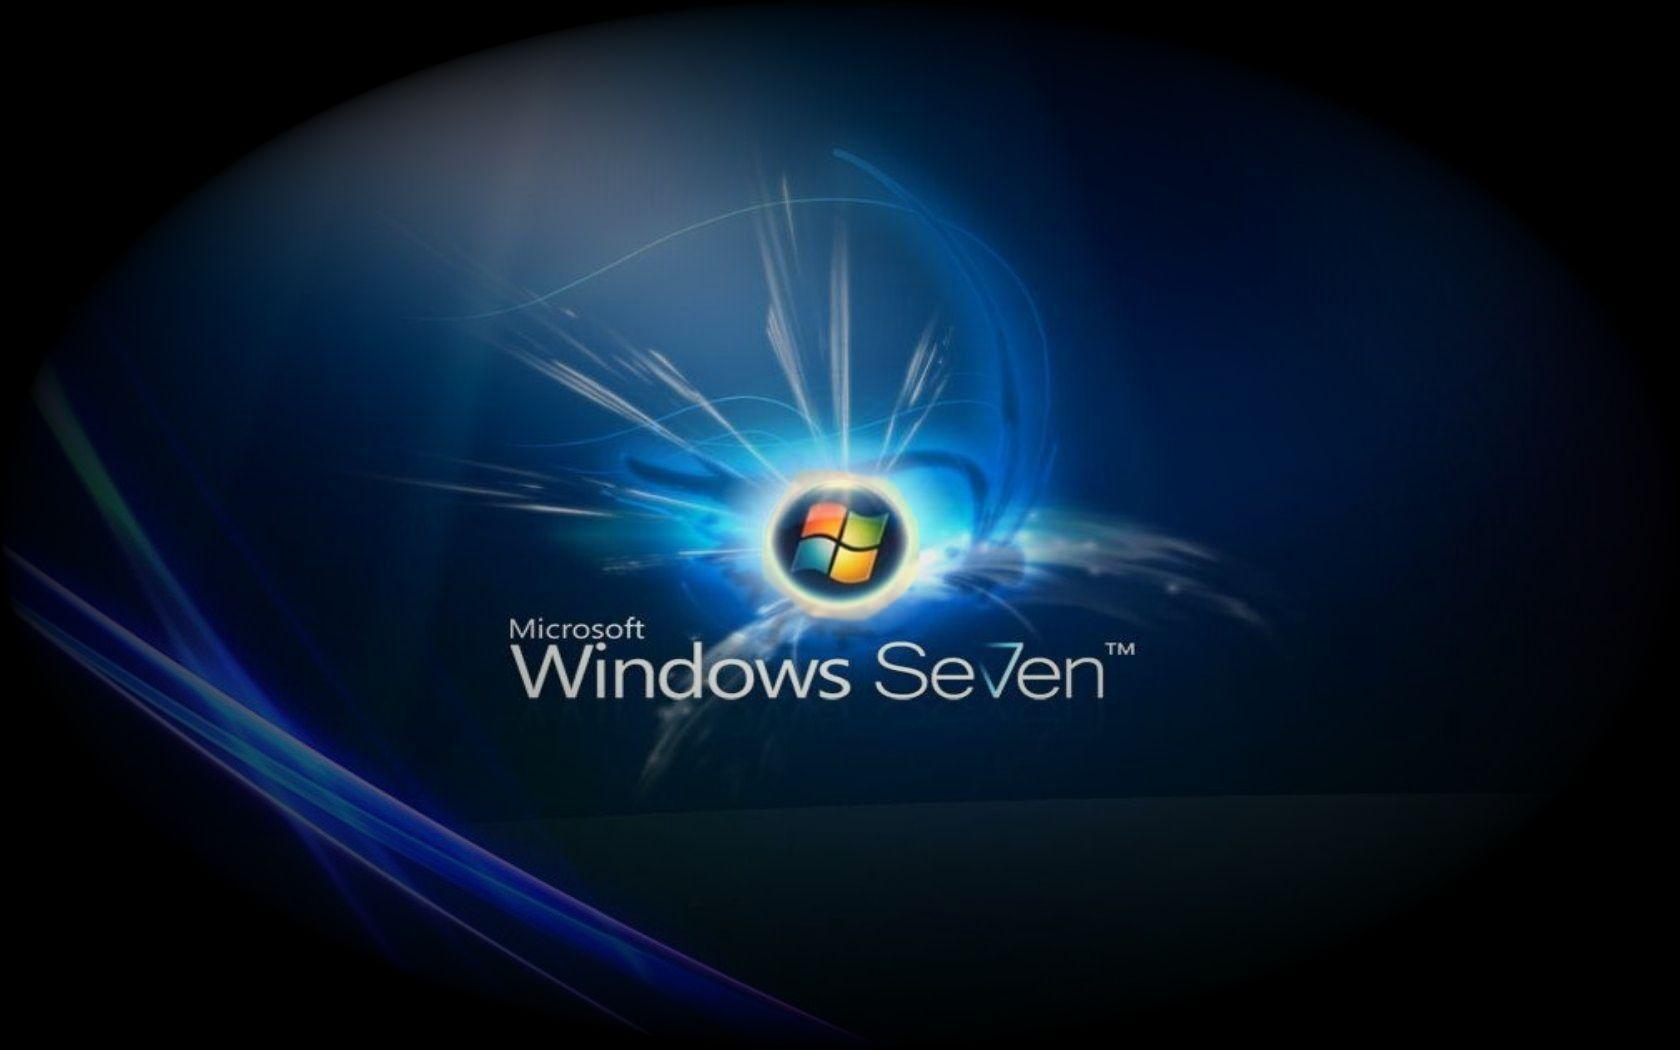 Windows 7 Ultimate Wallpapers Windows 7 Wallpaper Hd